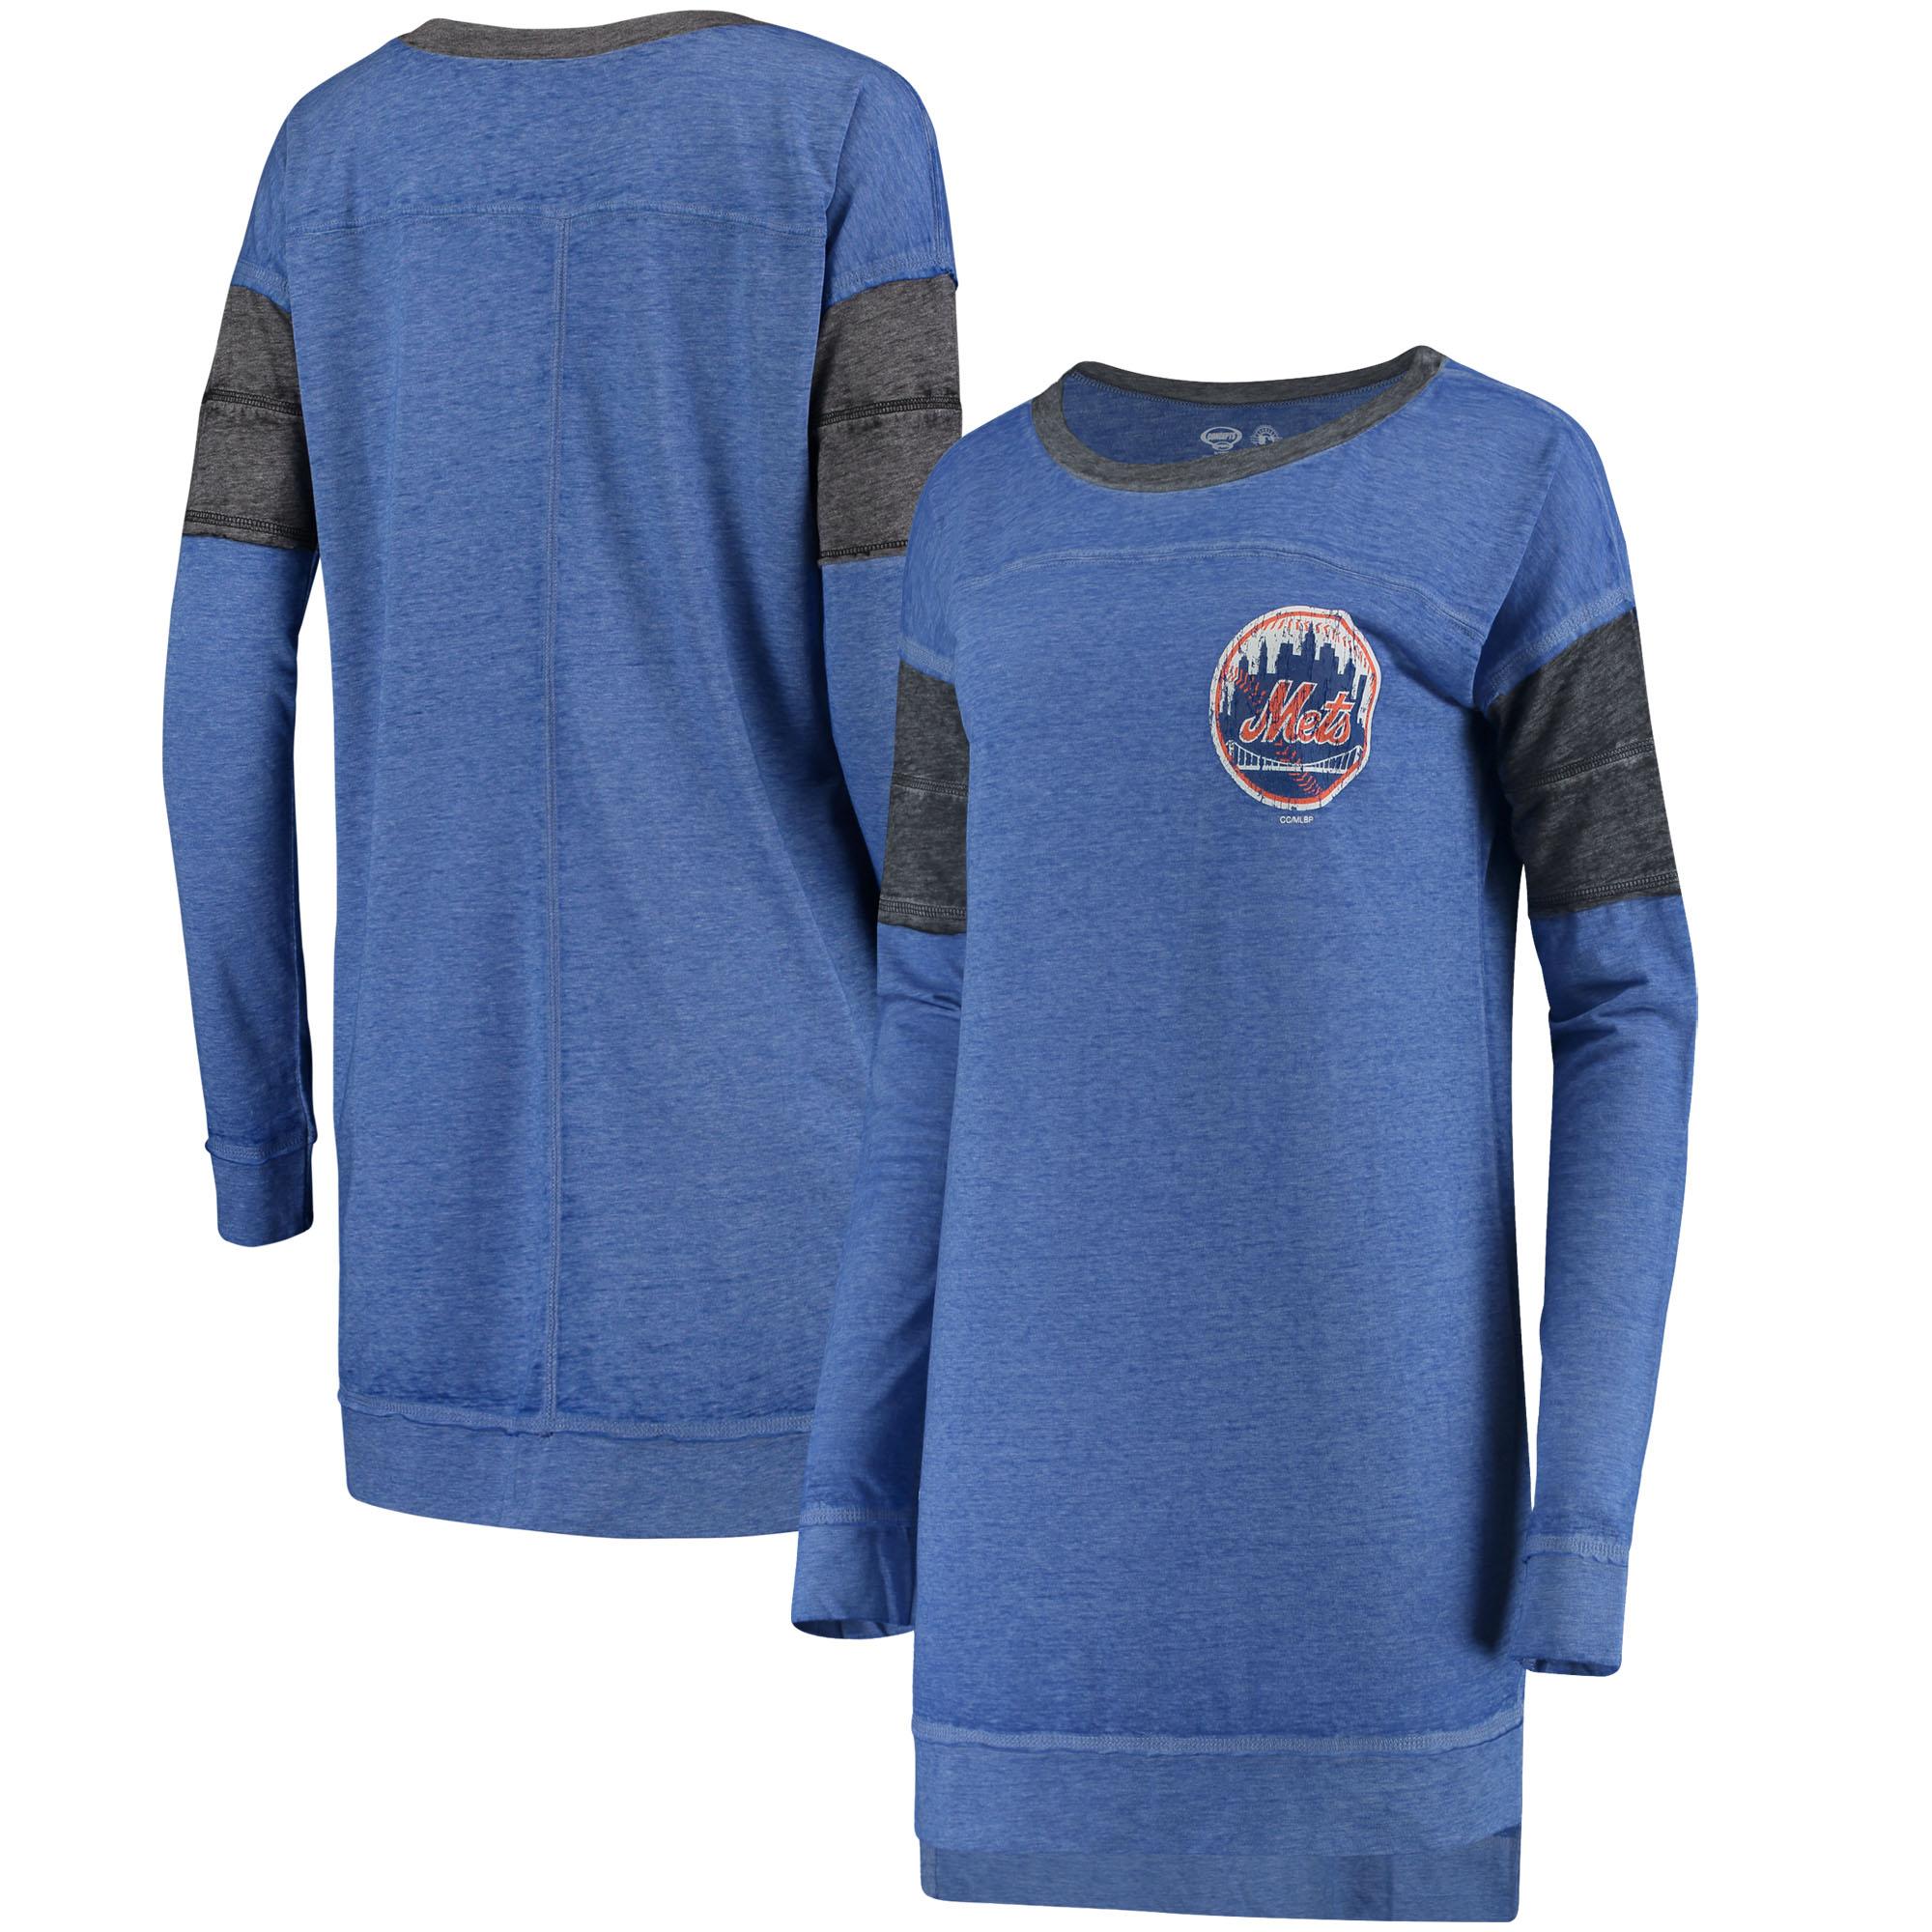 New York Mets Concepts Sport Women's Touchstone Nightshirt - Royal